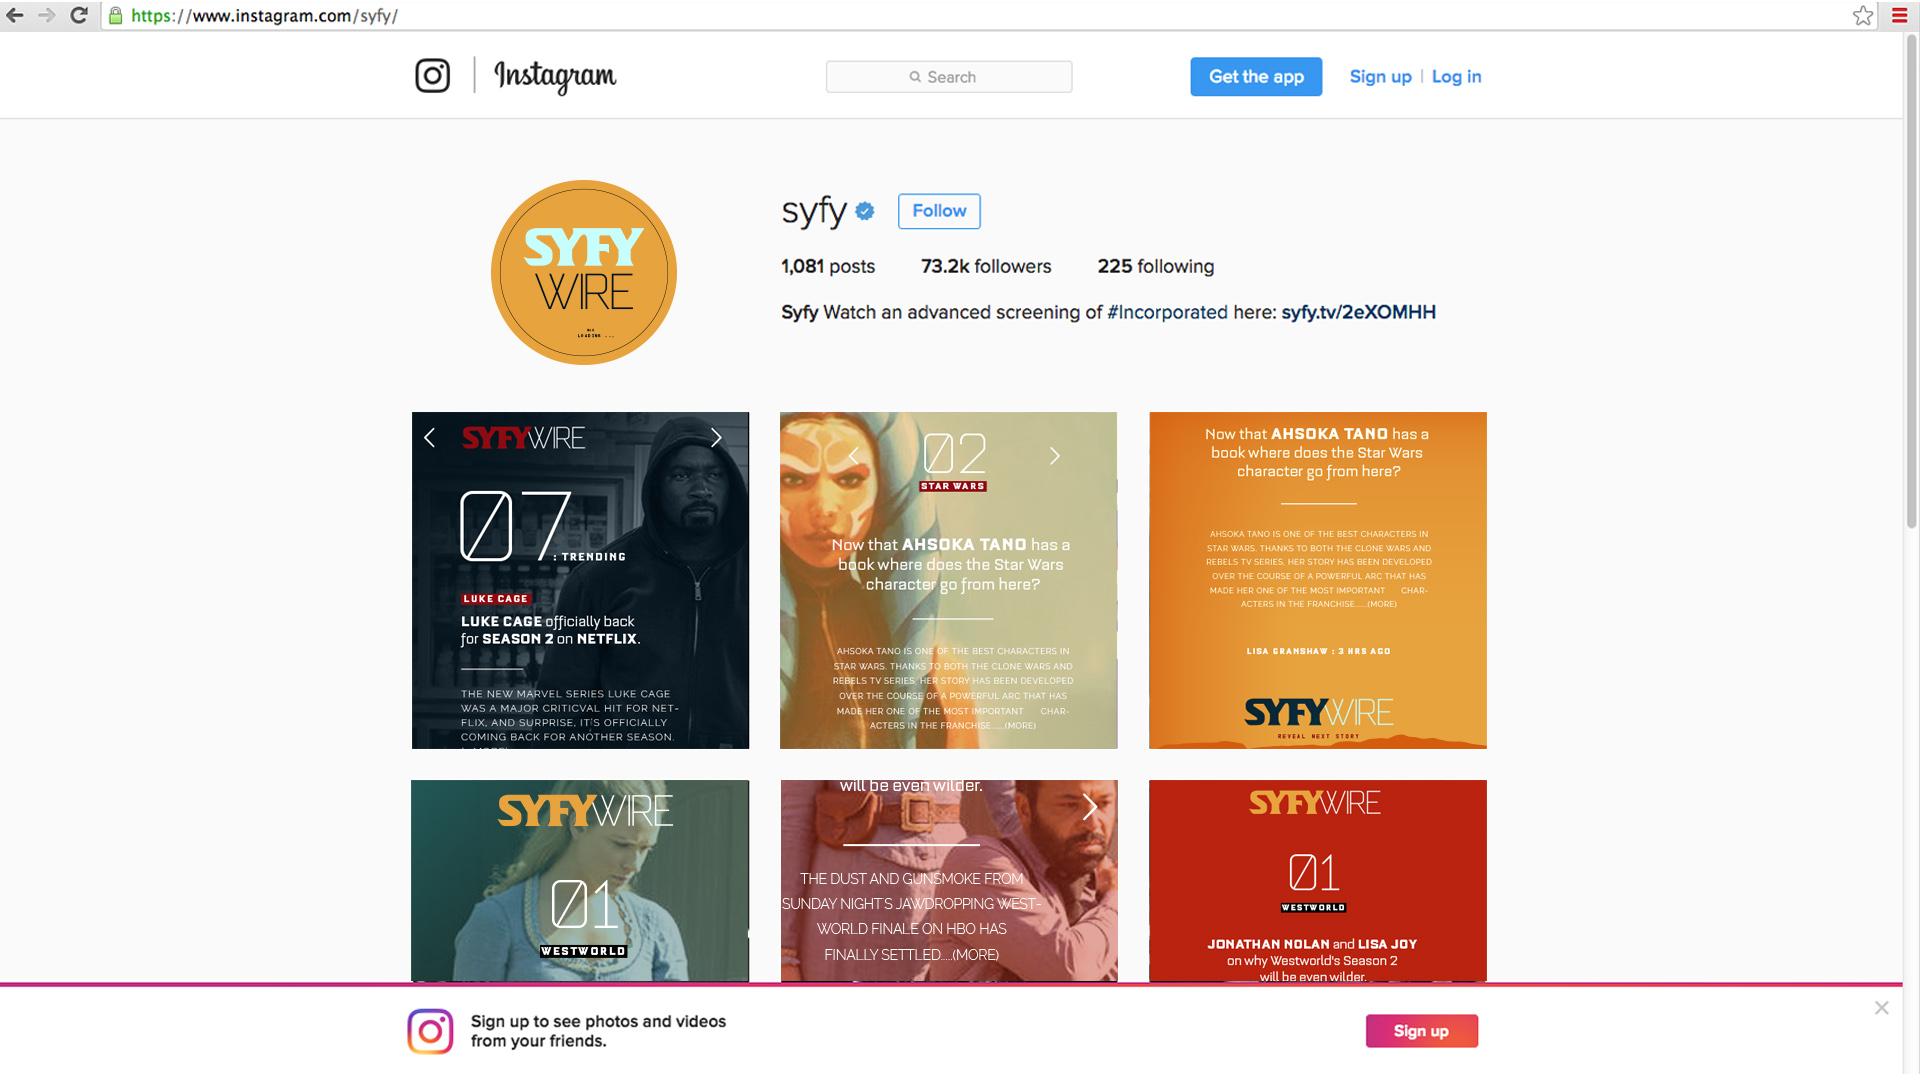 gh_LK_SyFyWire-3rdparty_Instagram-Layout2.jpg